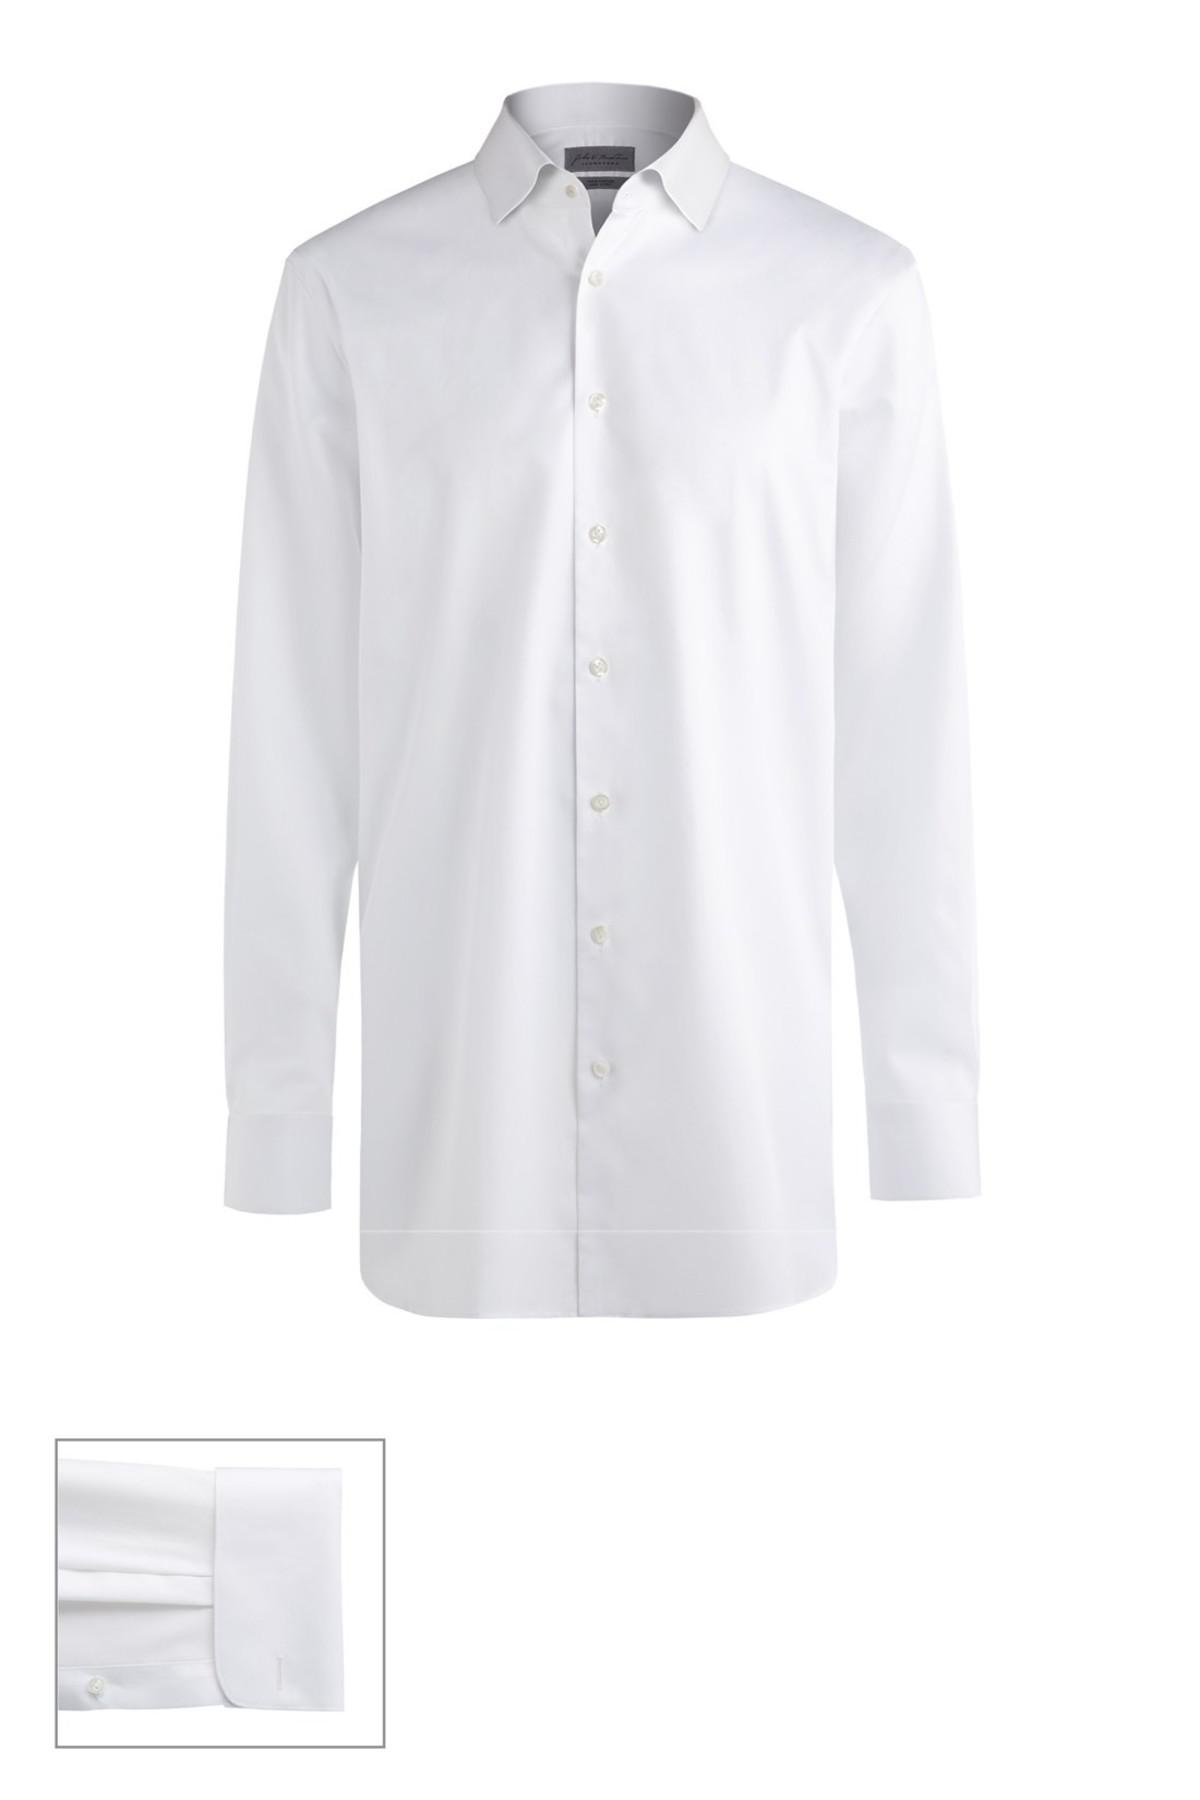 John w nordstrom r made to measure extra trim fit short for Extra trim fit dress shirt